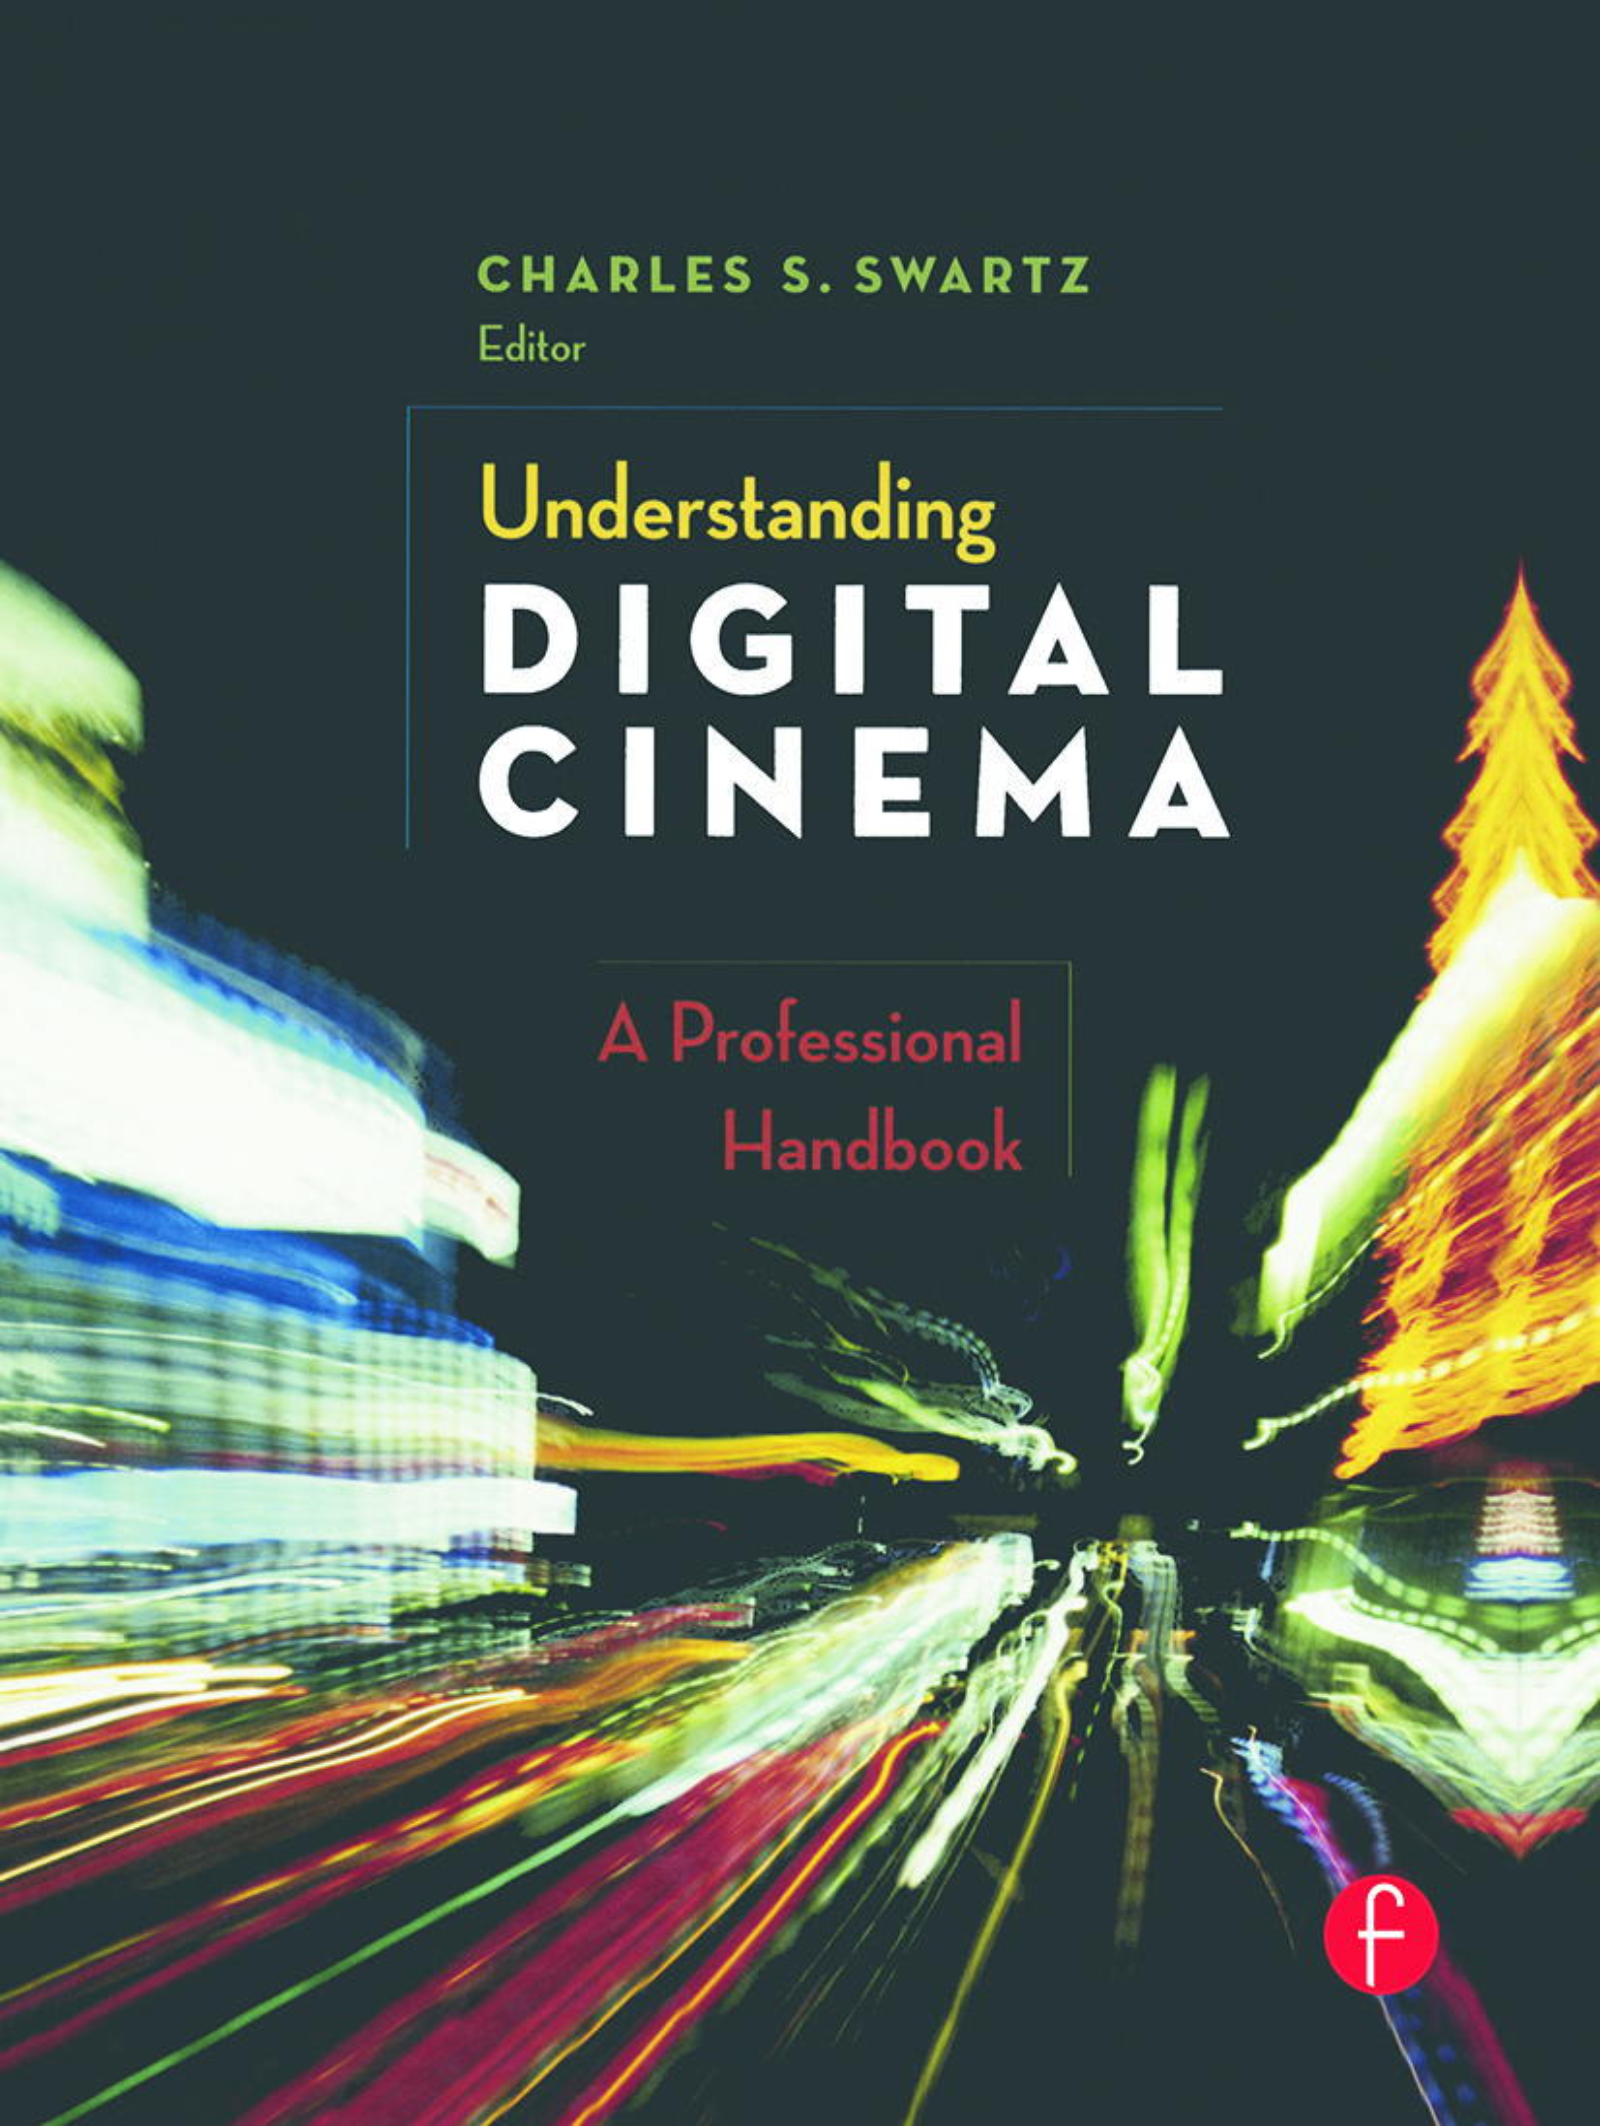 Understanding Digital Cinema: A Professional Handbook book cover